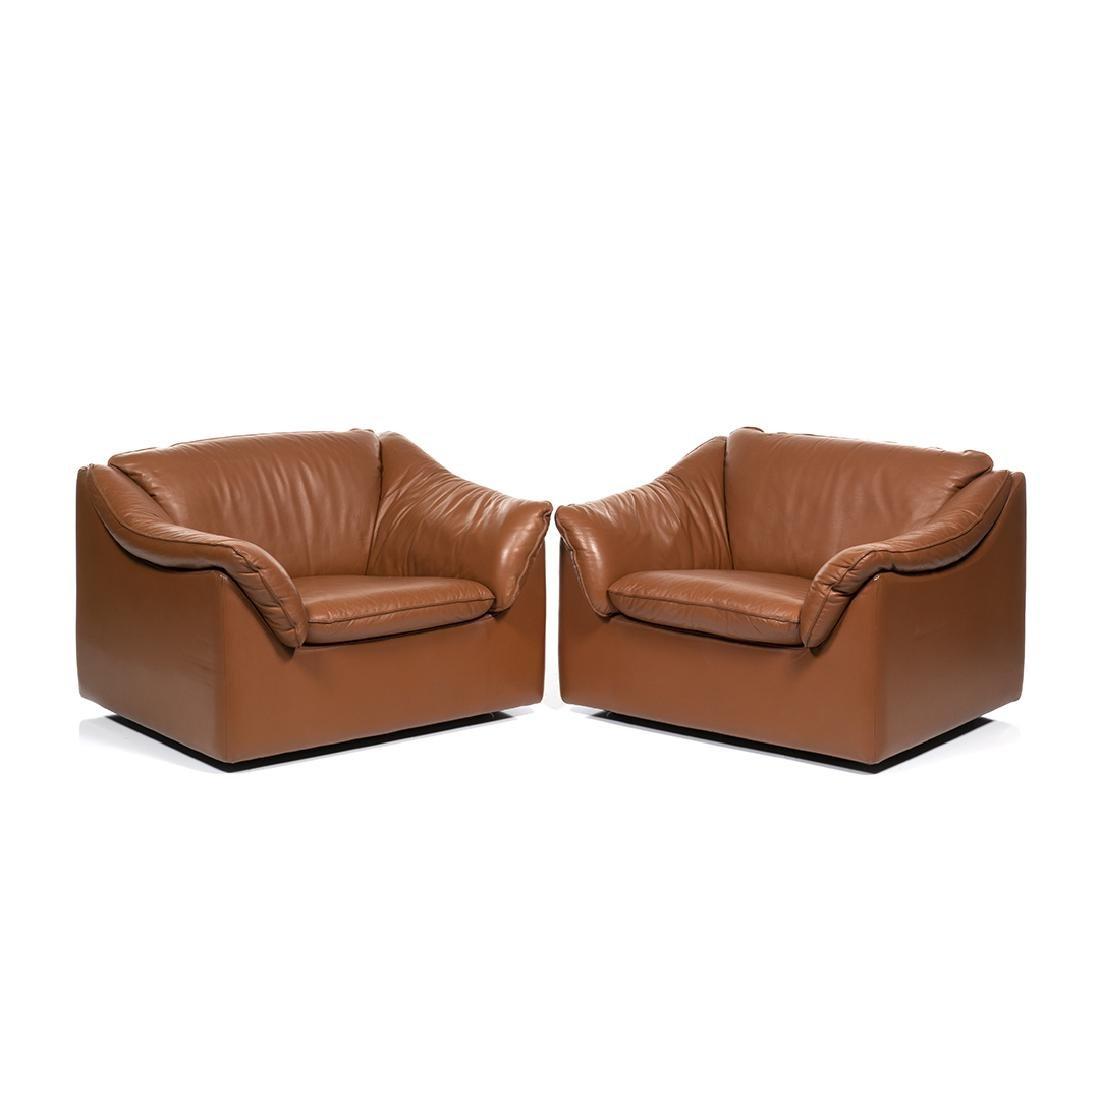 Pair of Metropolitan Leather Club Chairs (2)